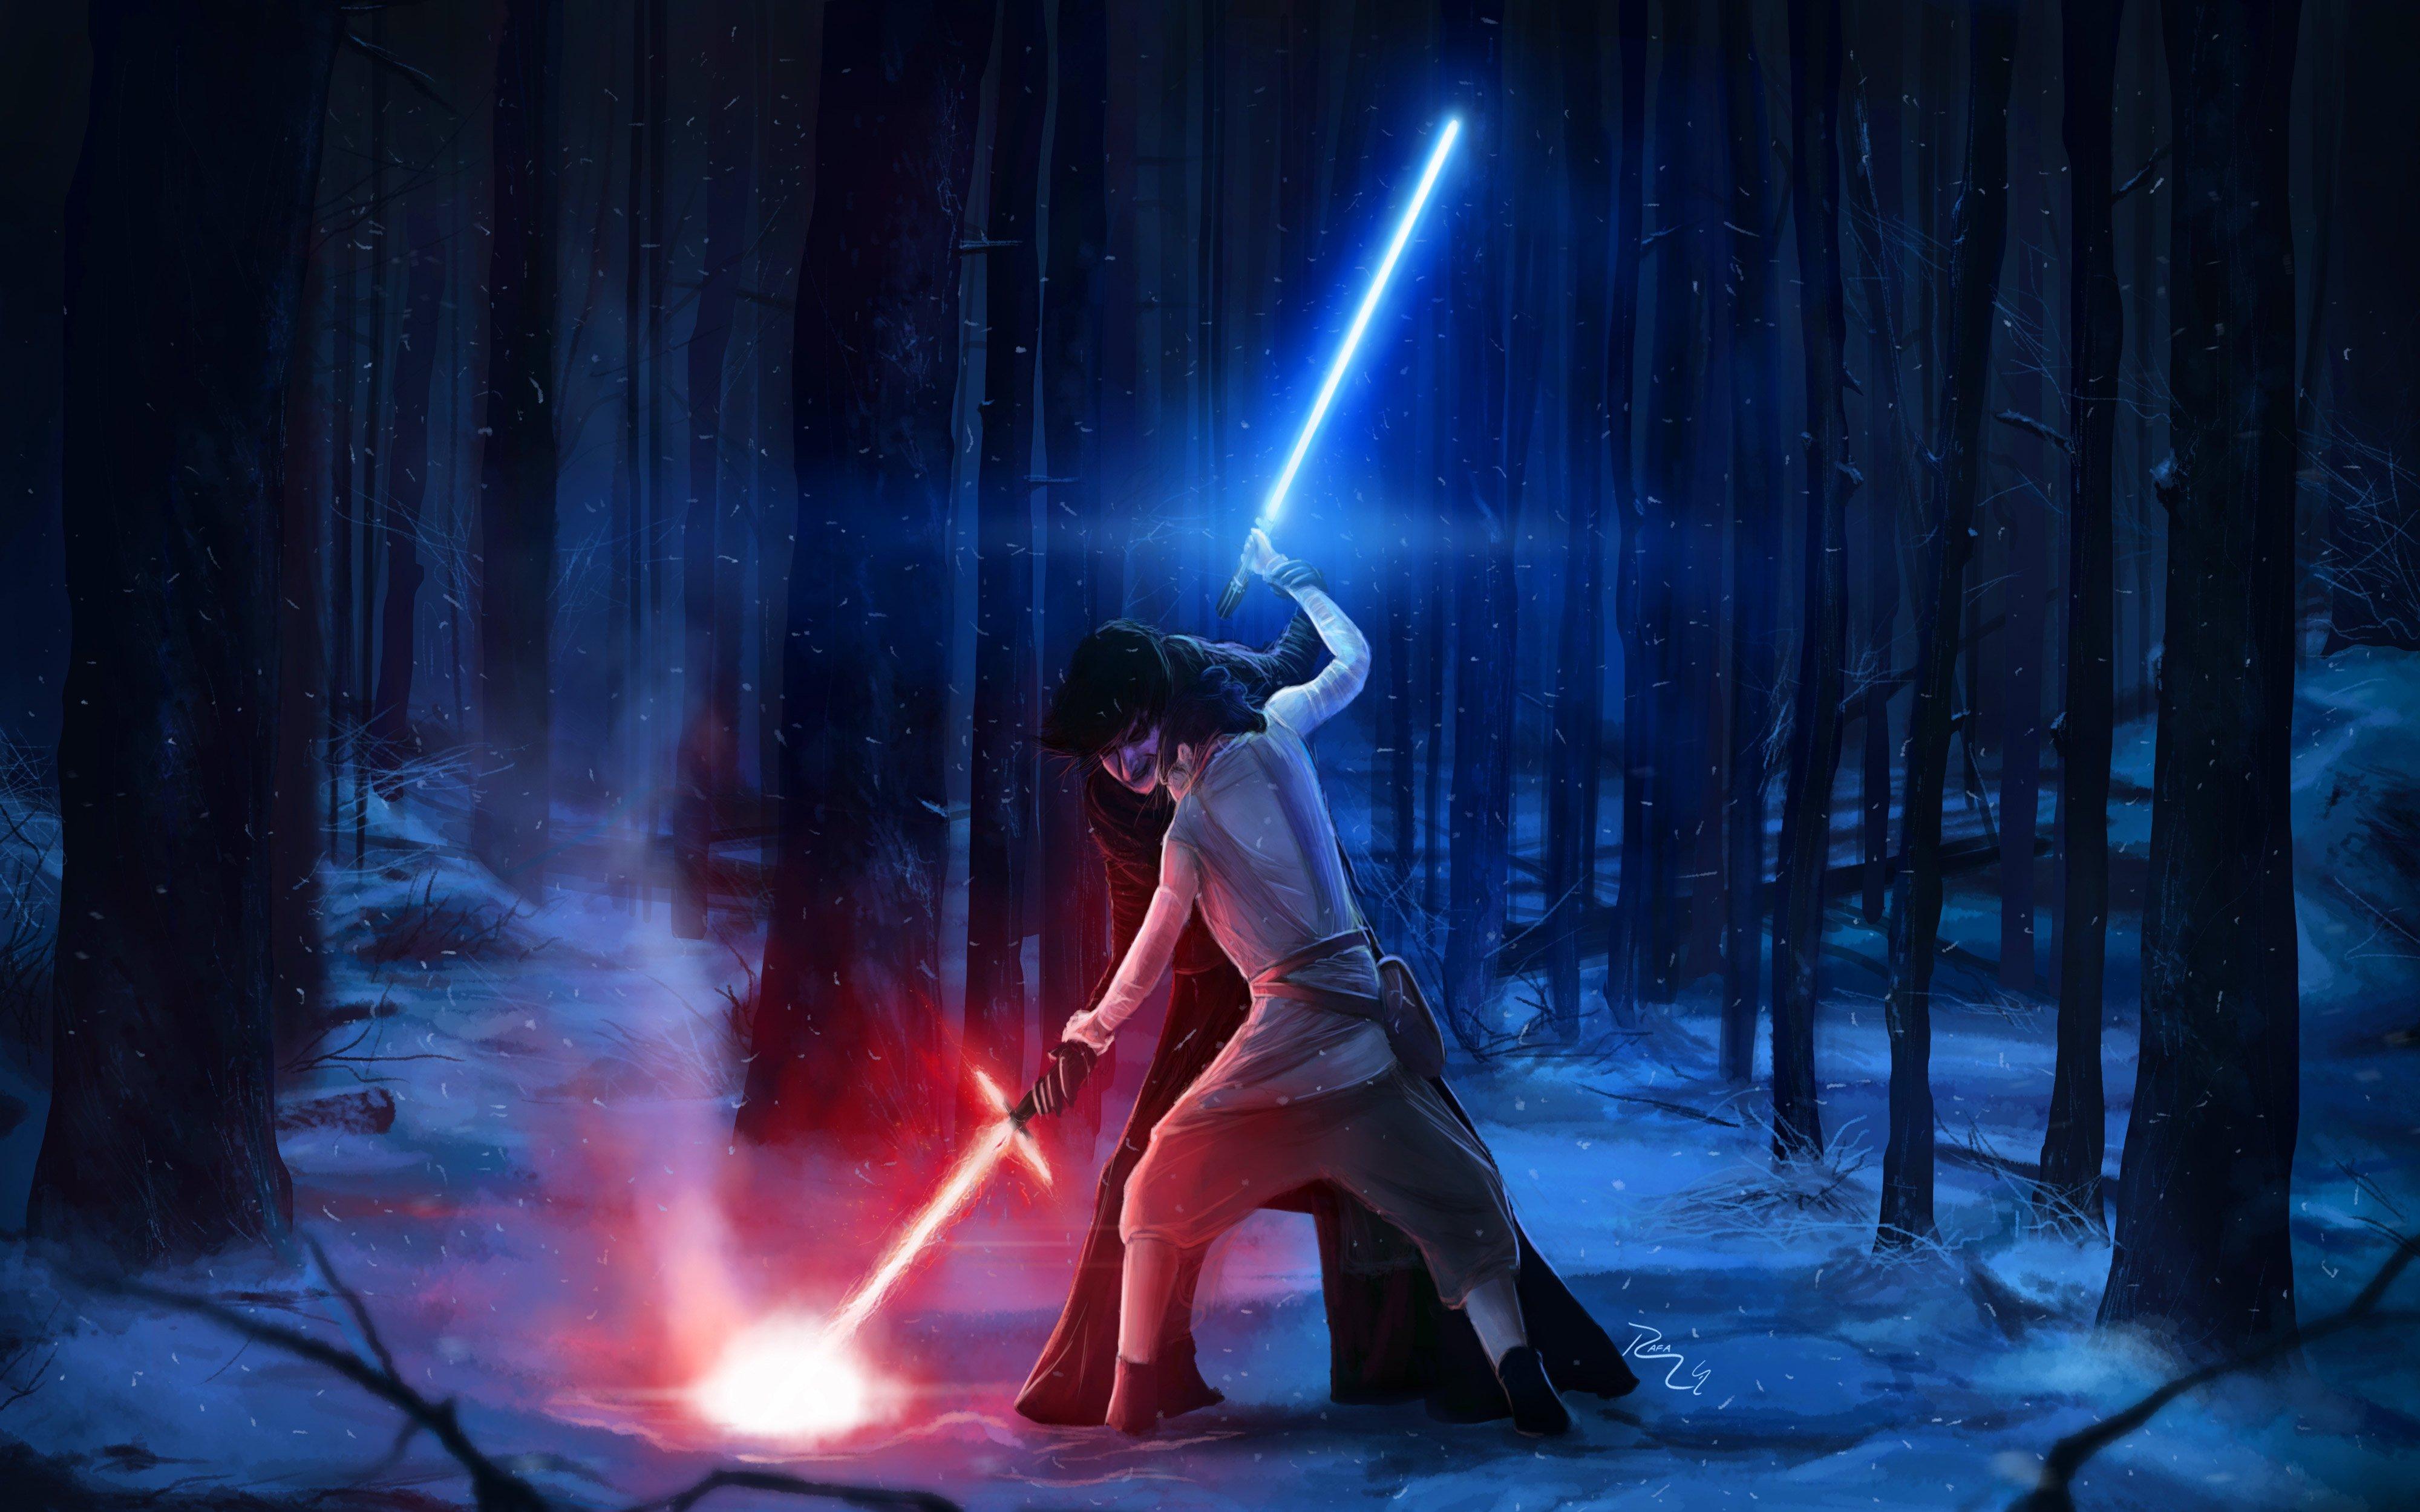 Star Wars Rey Wallpapers